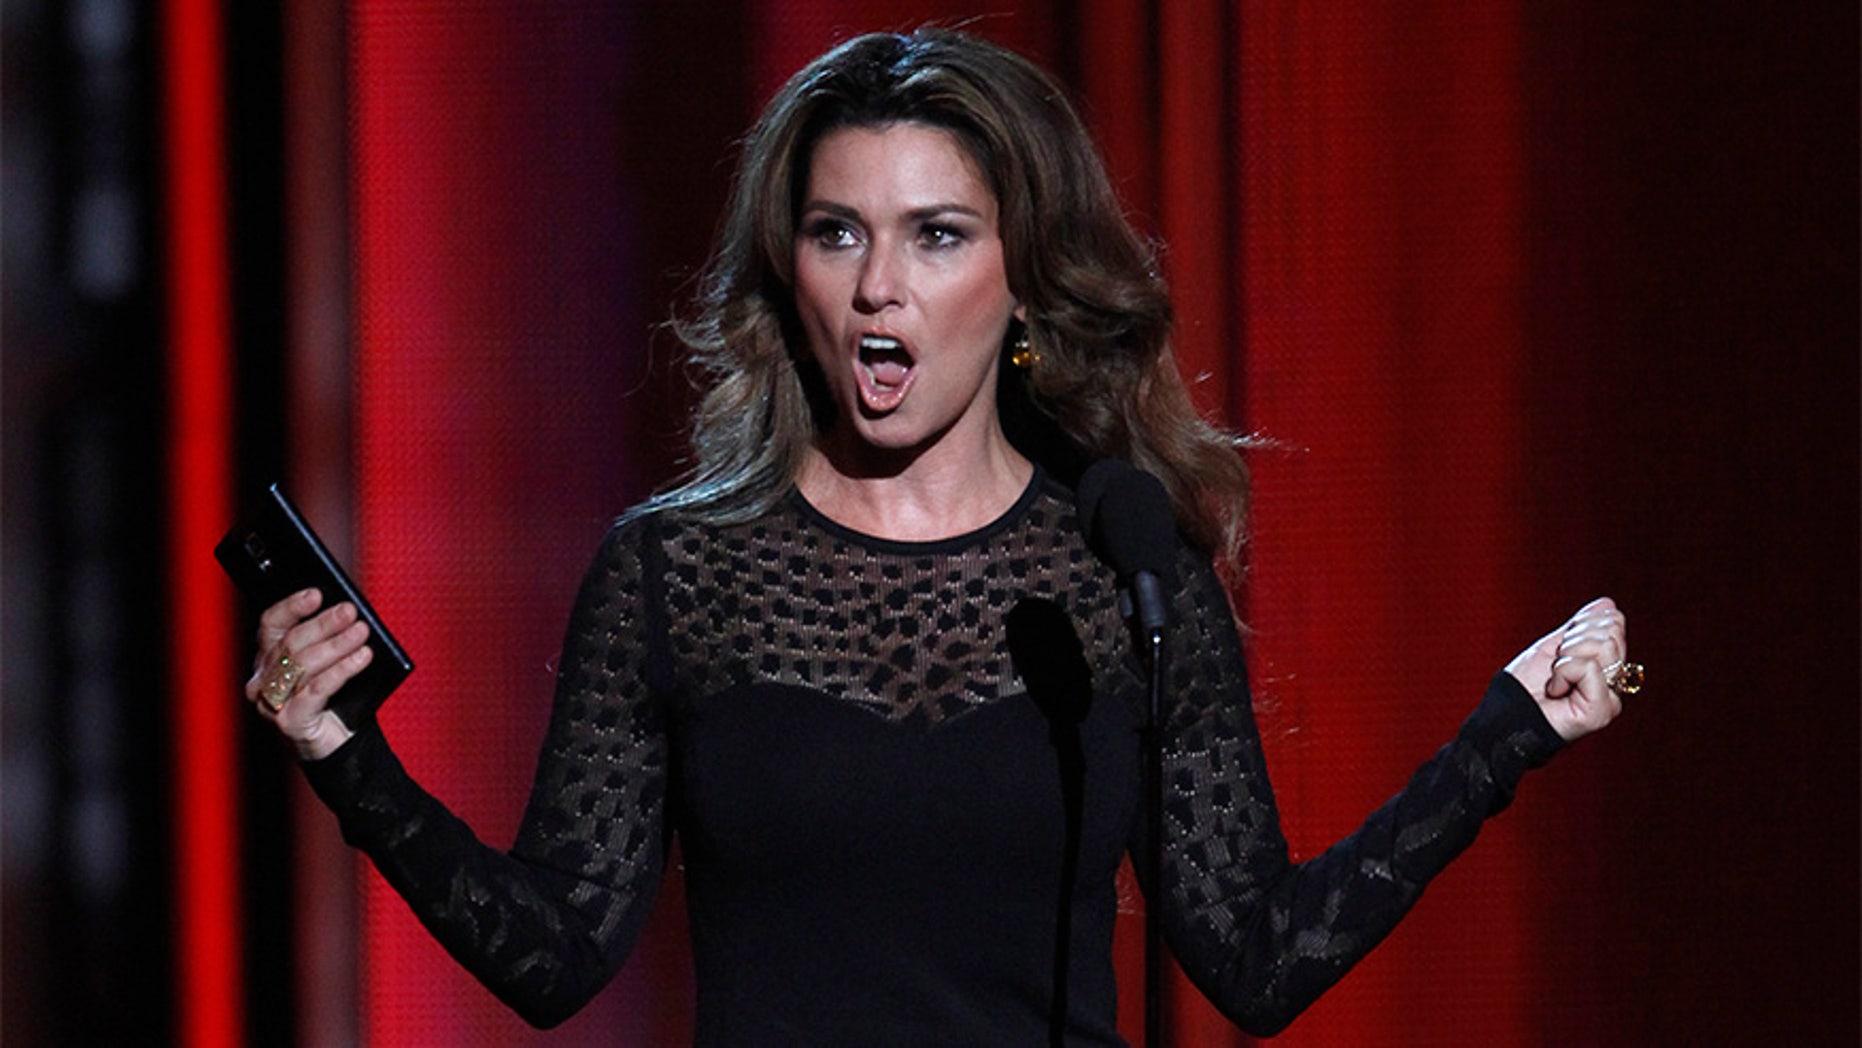 Country singer Shania Twain presents an award at the 2014 Billboard Music Awards in Las Vegas.